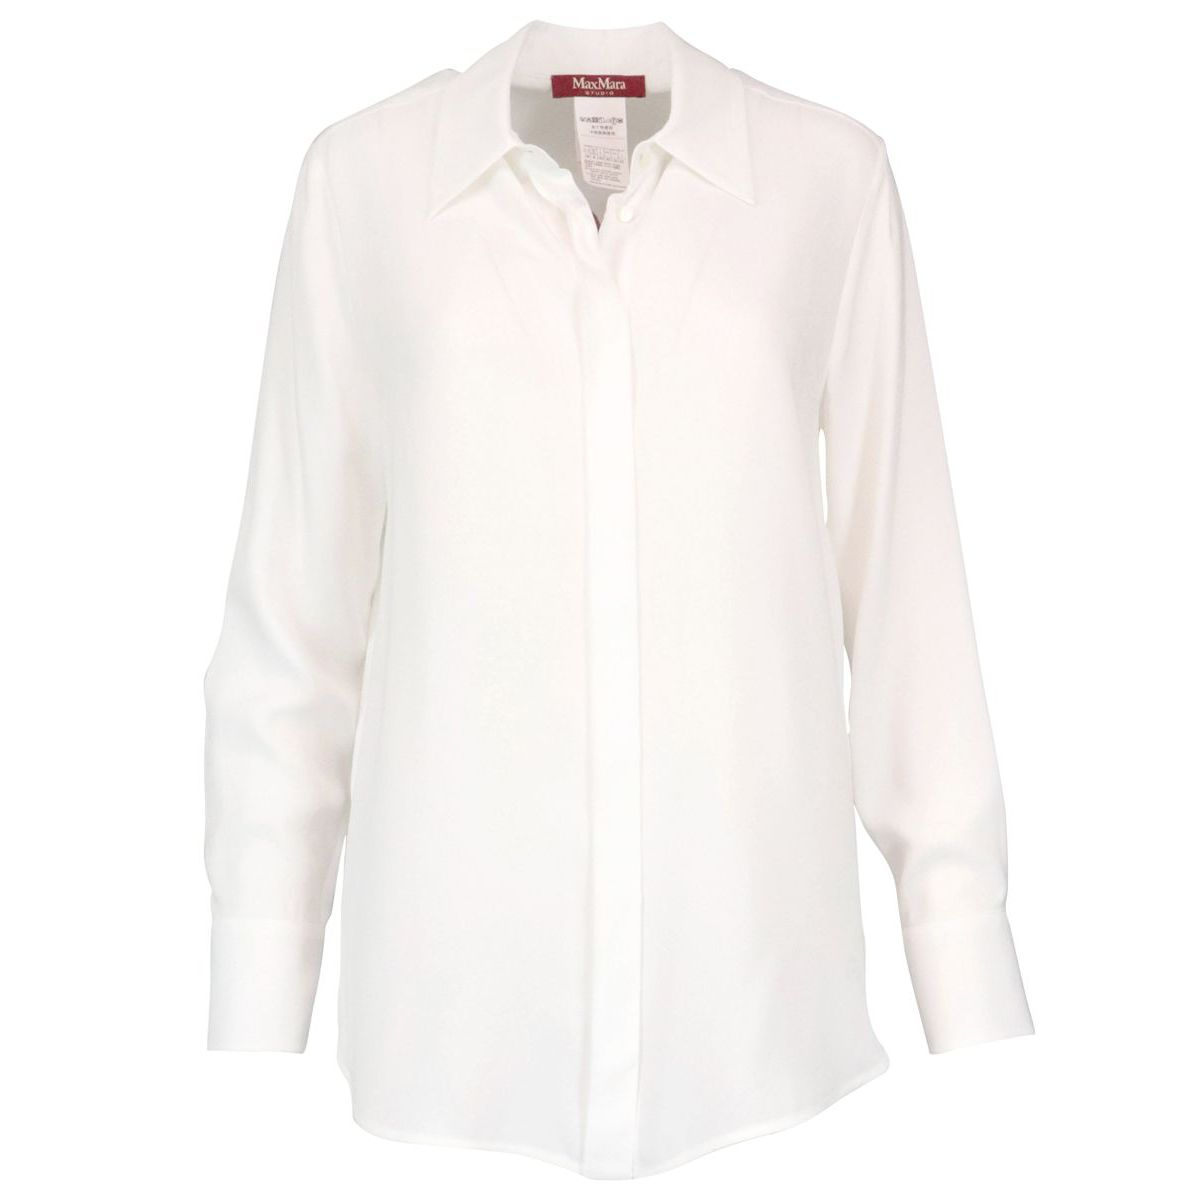 Enea pure silk shirt Optical white MAX MARA STUDIO